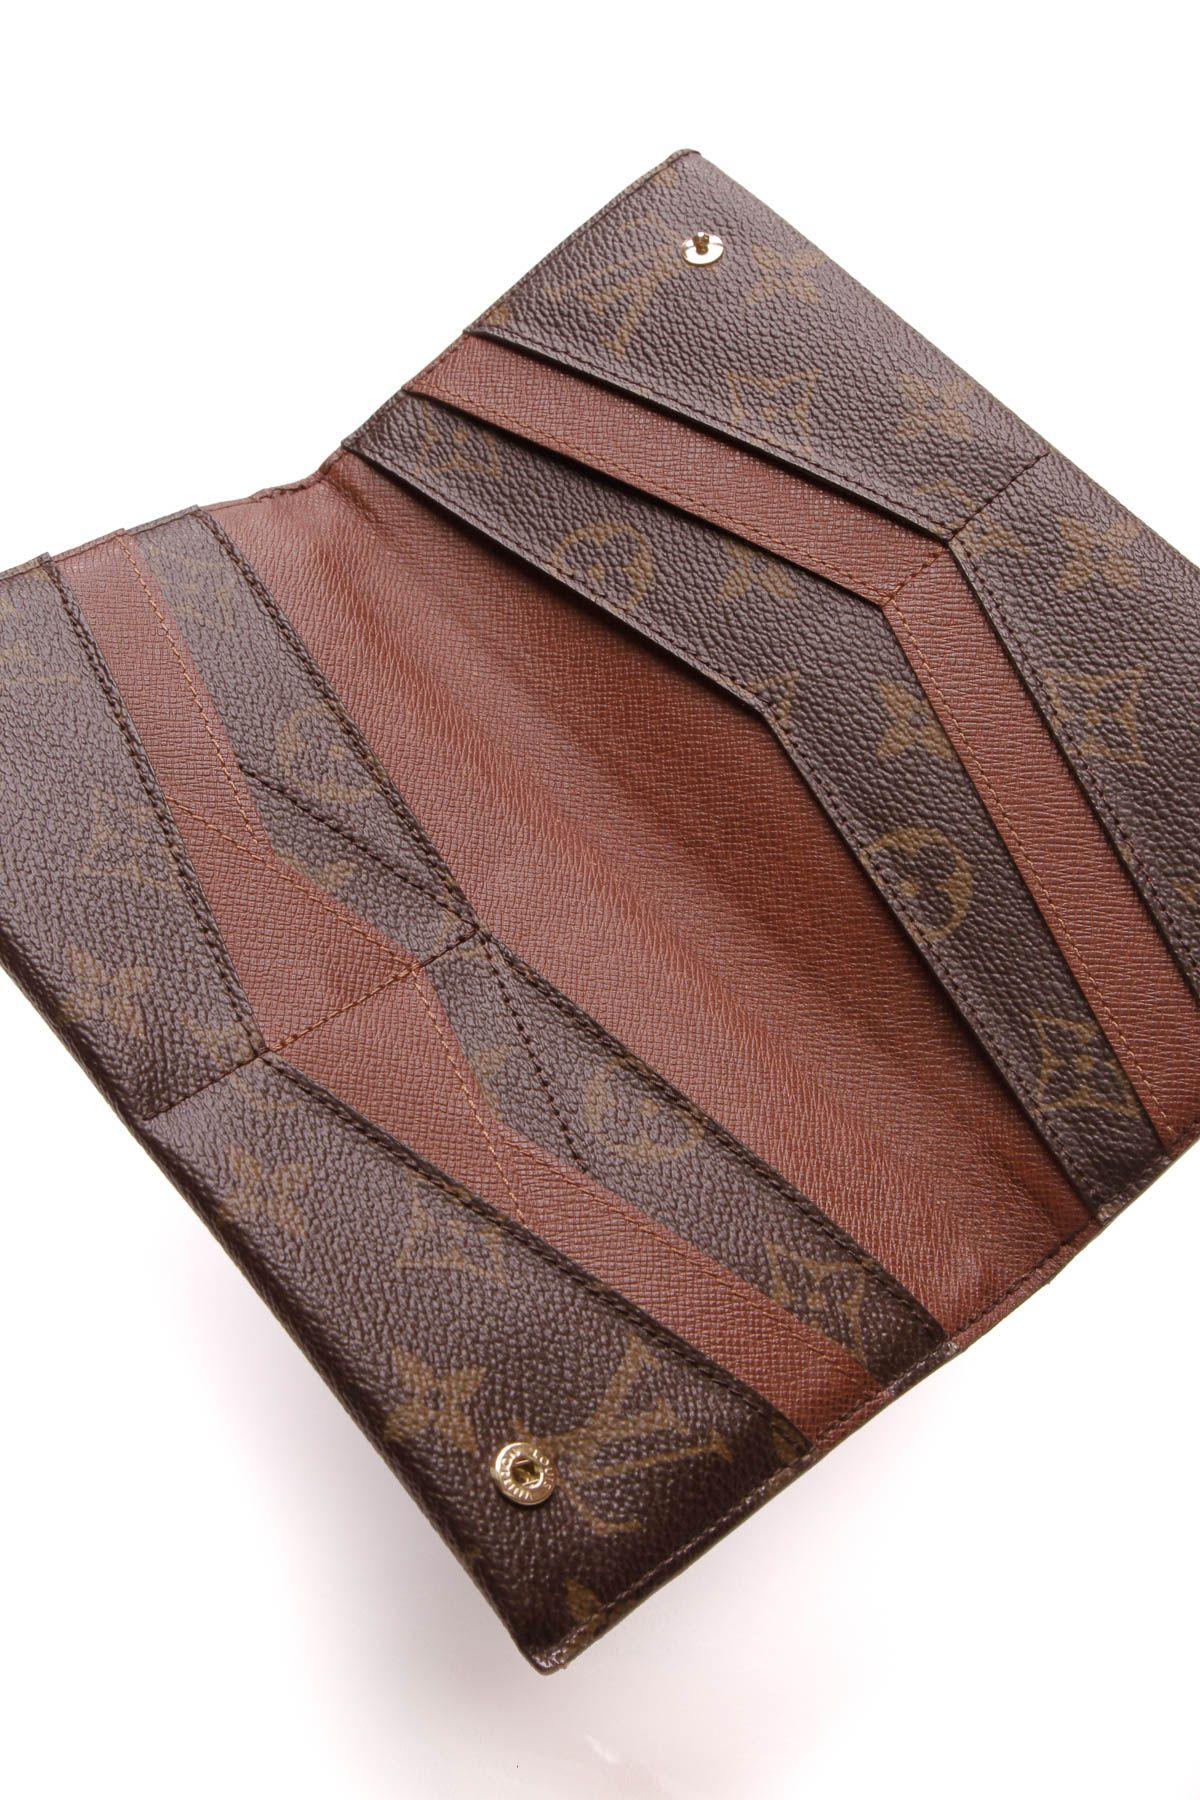 Louis Vuitton Origami Wallet Louis Louis Origami Wallet Louis